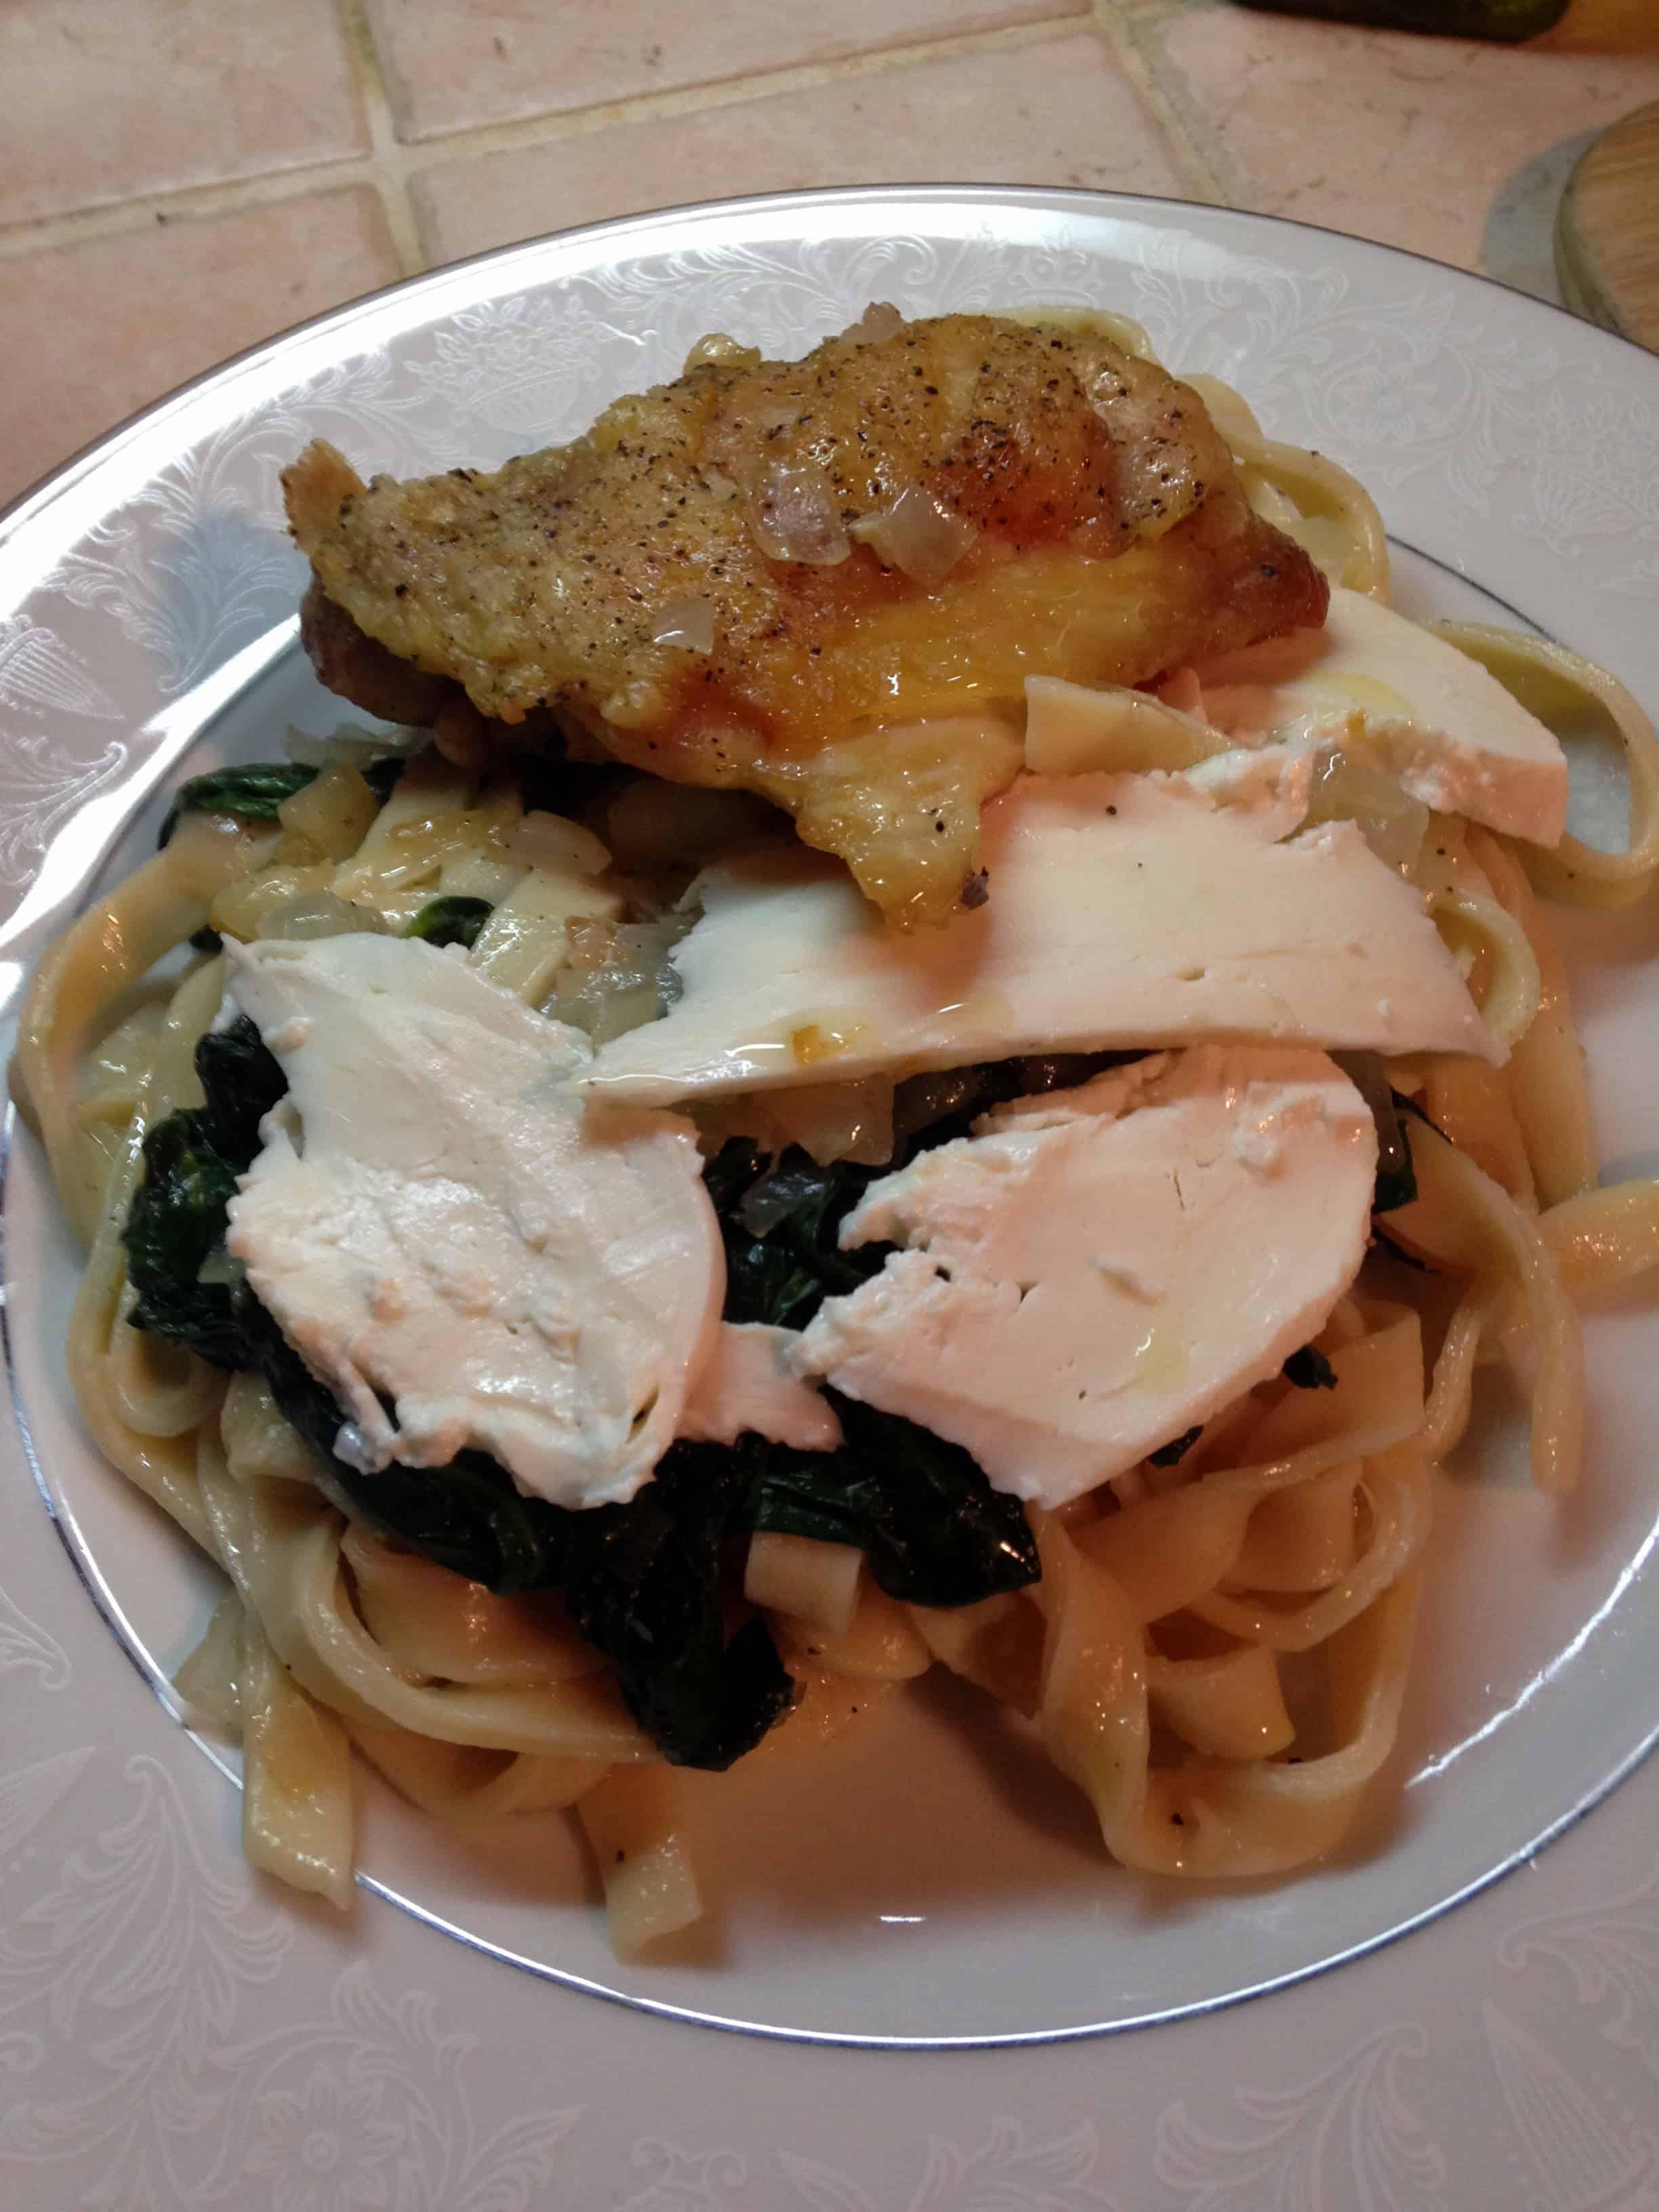 http://scratchitcook.com/2014/01/22/weeknight-chicken-and-pasta/